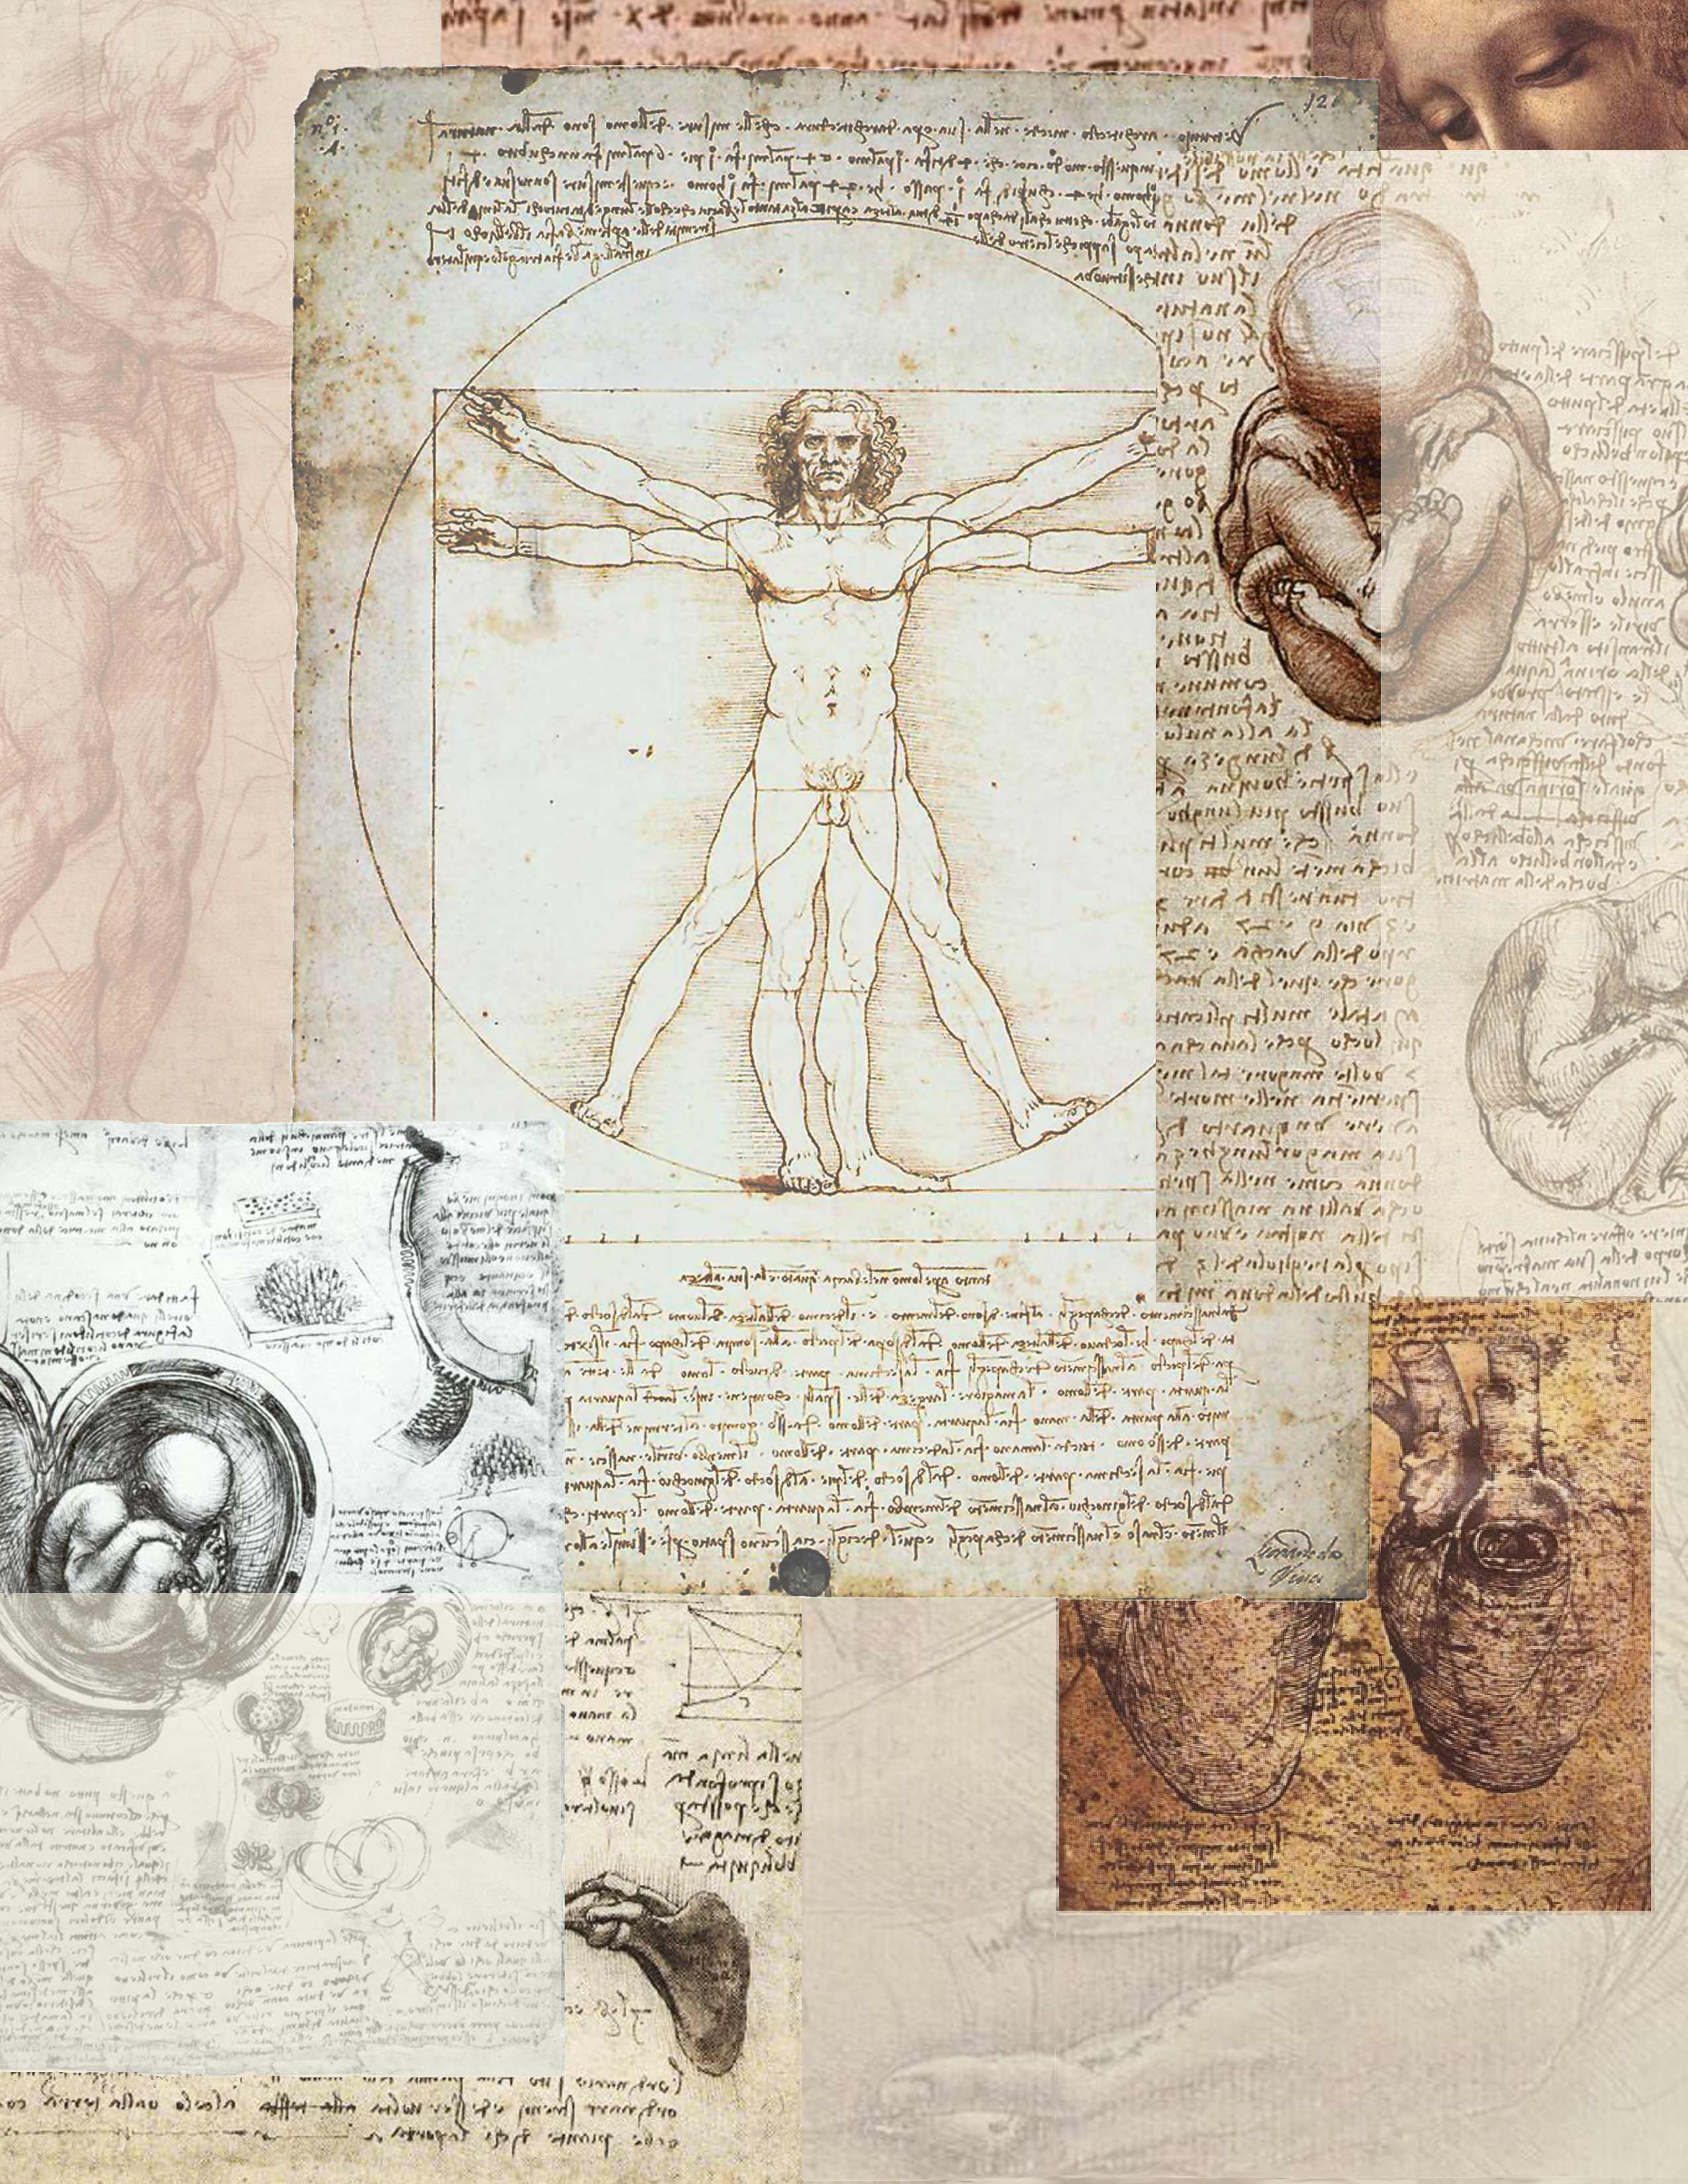 Graphic Art Inspired by Leonardo da Vinci's Notebooks